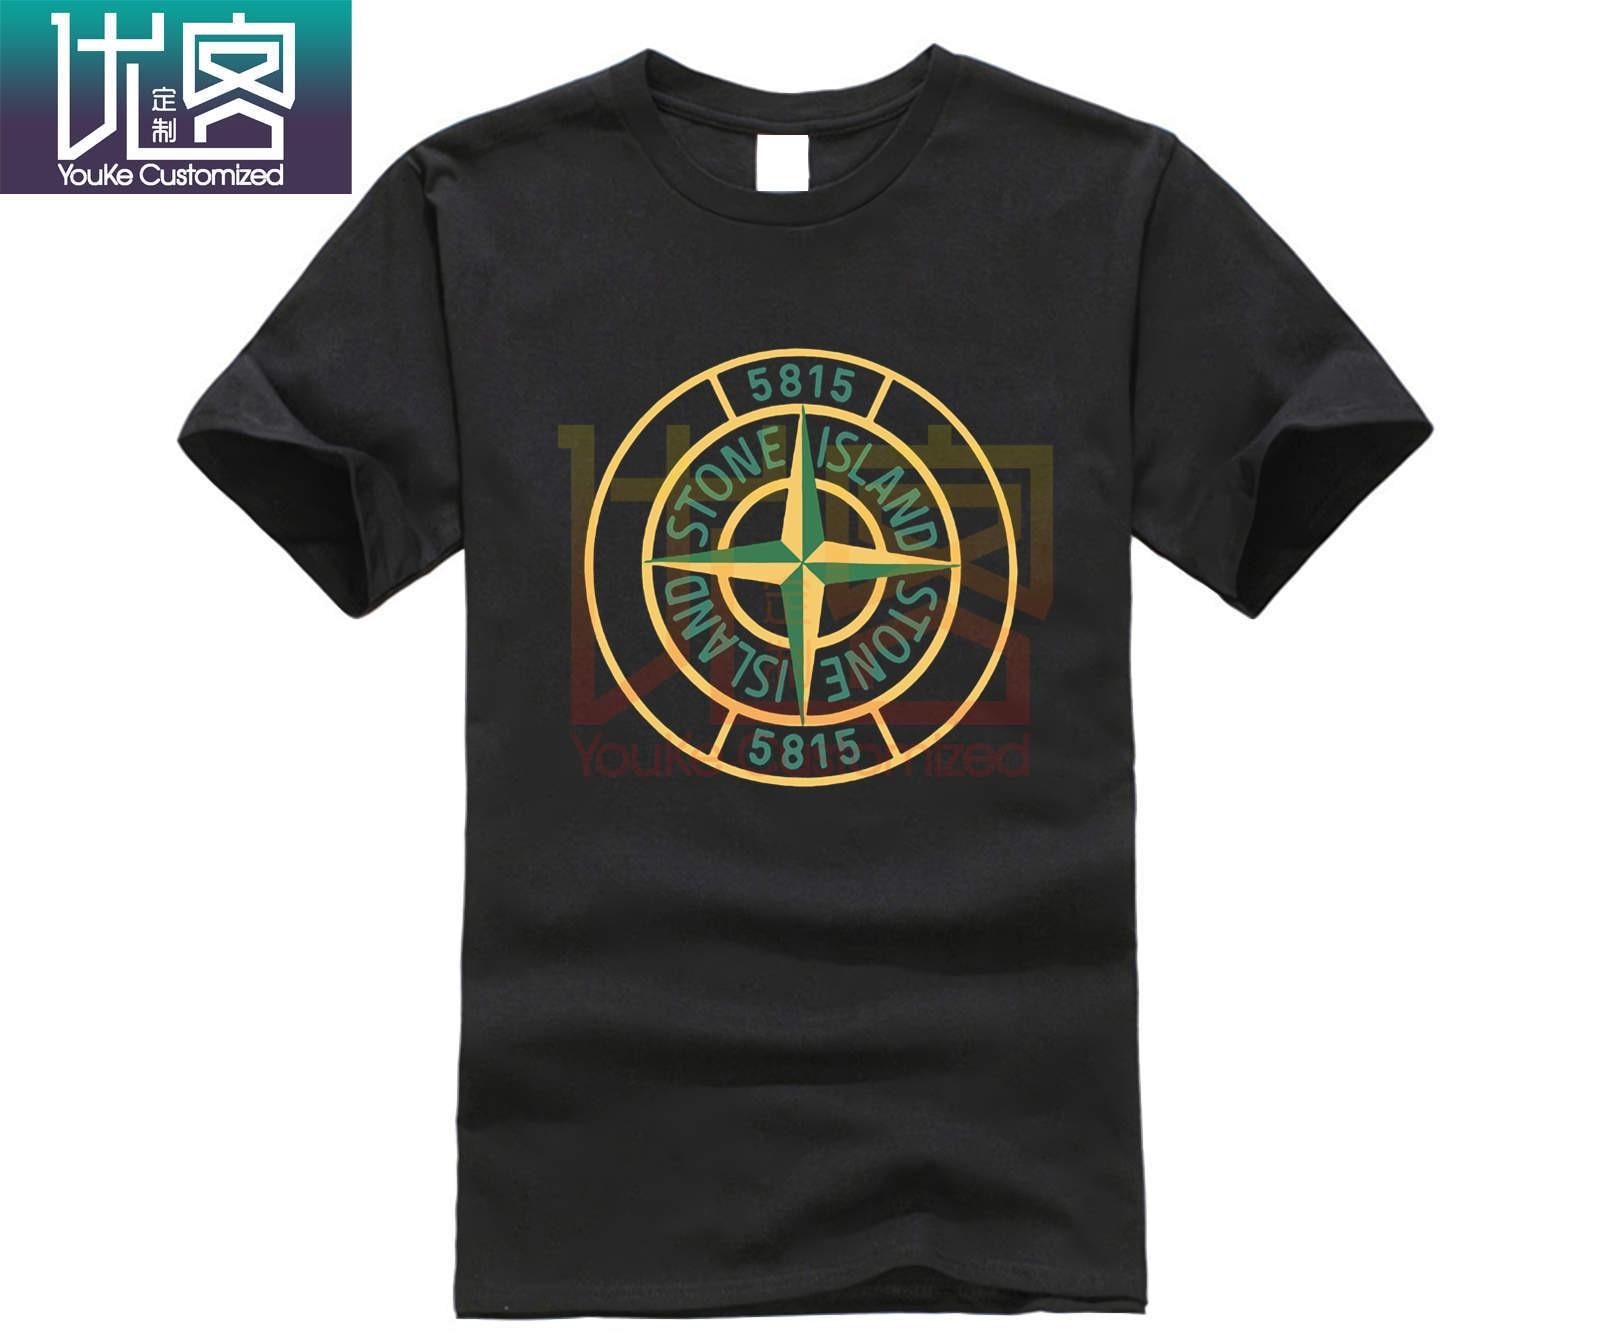 2020 Summer NEW Stone-Island T Shirt For Men Limitied Edition Men's Black Brand T-Shirt